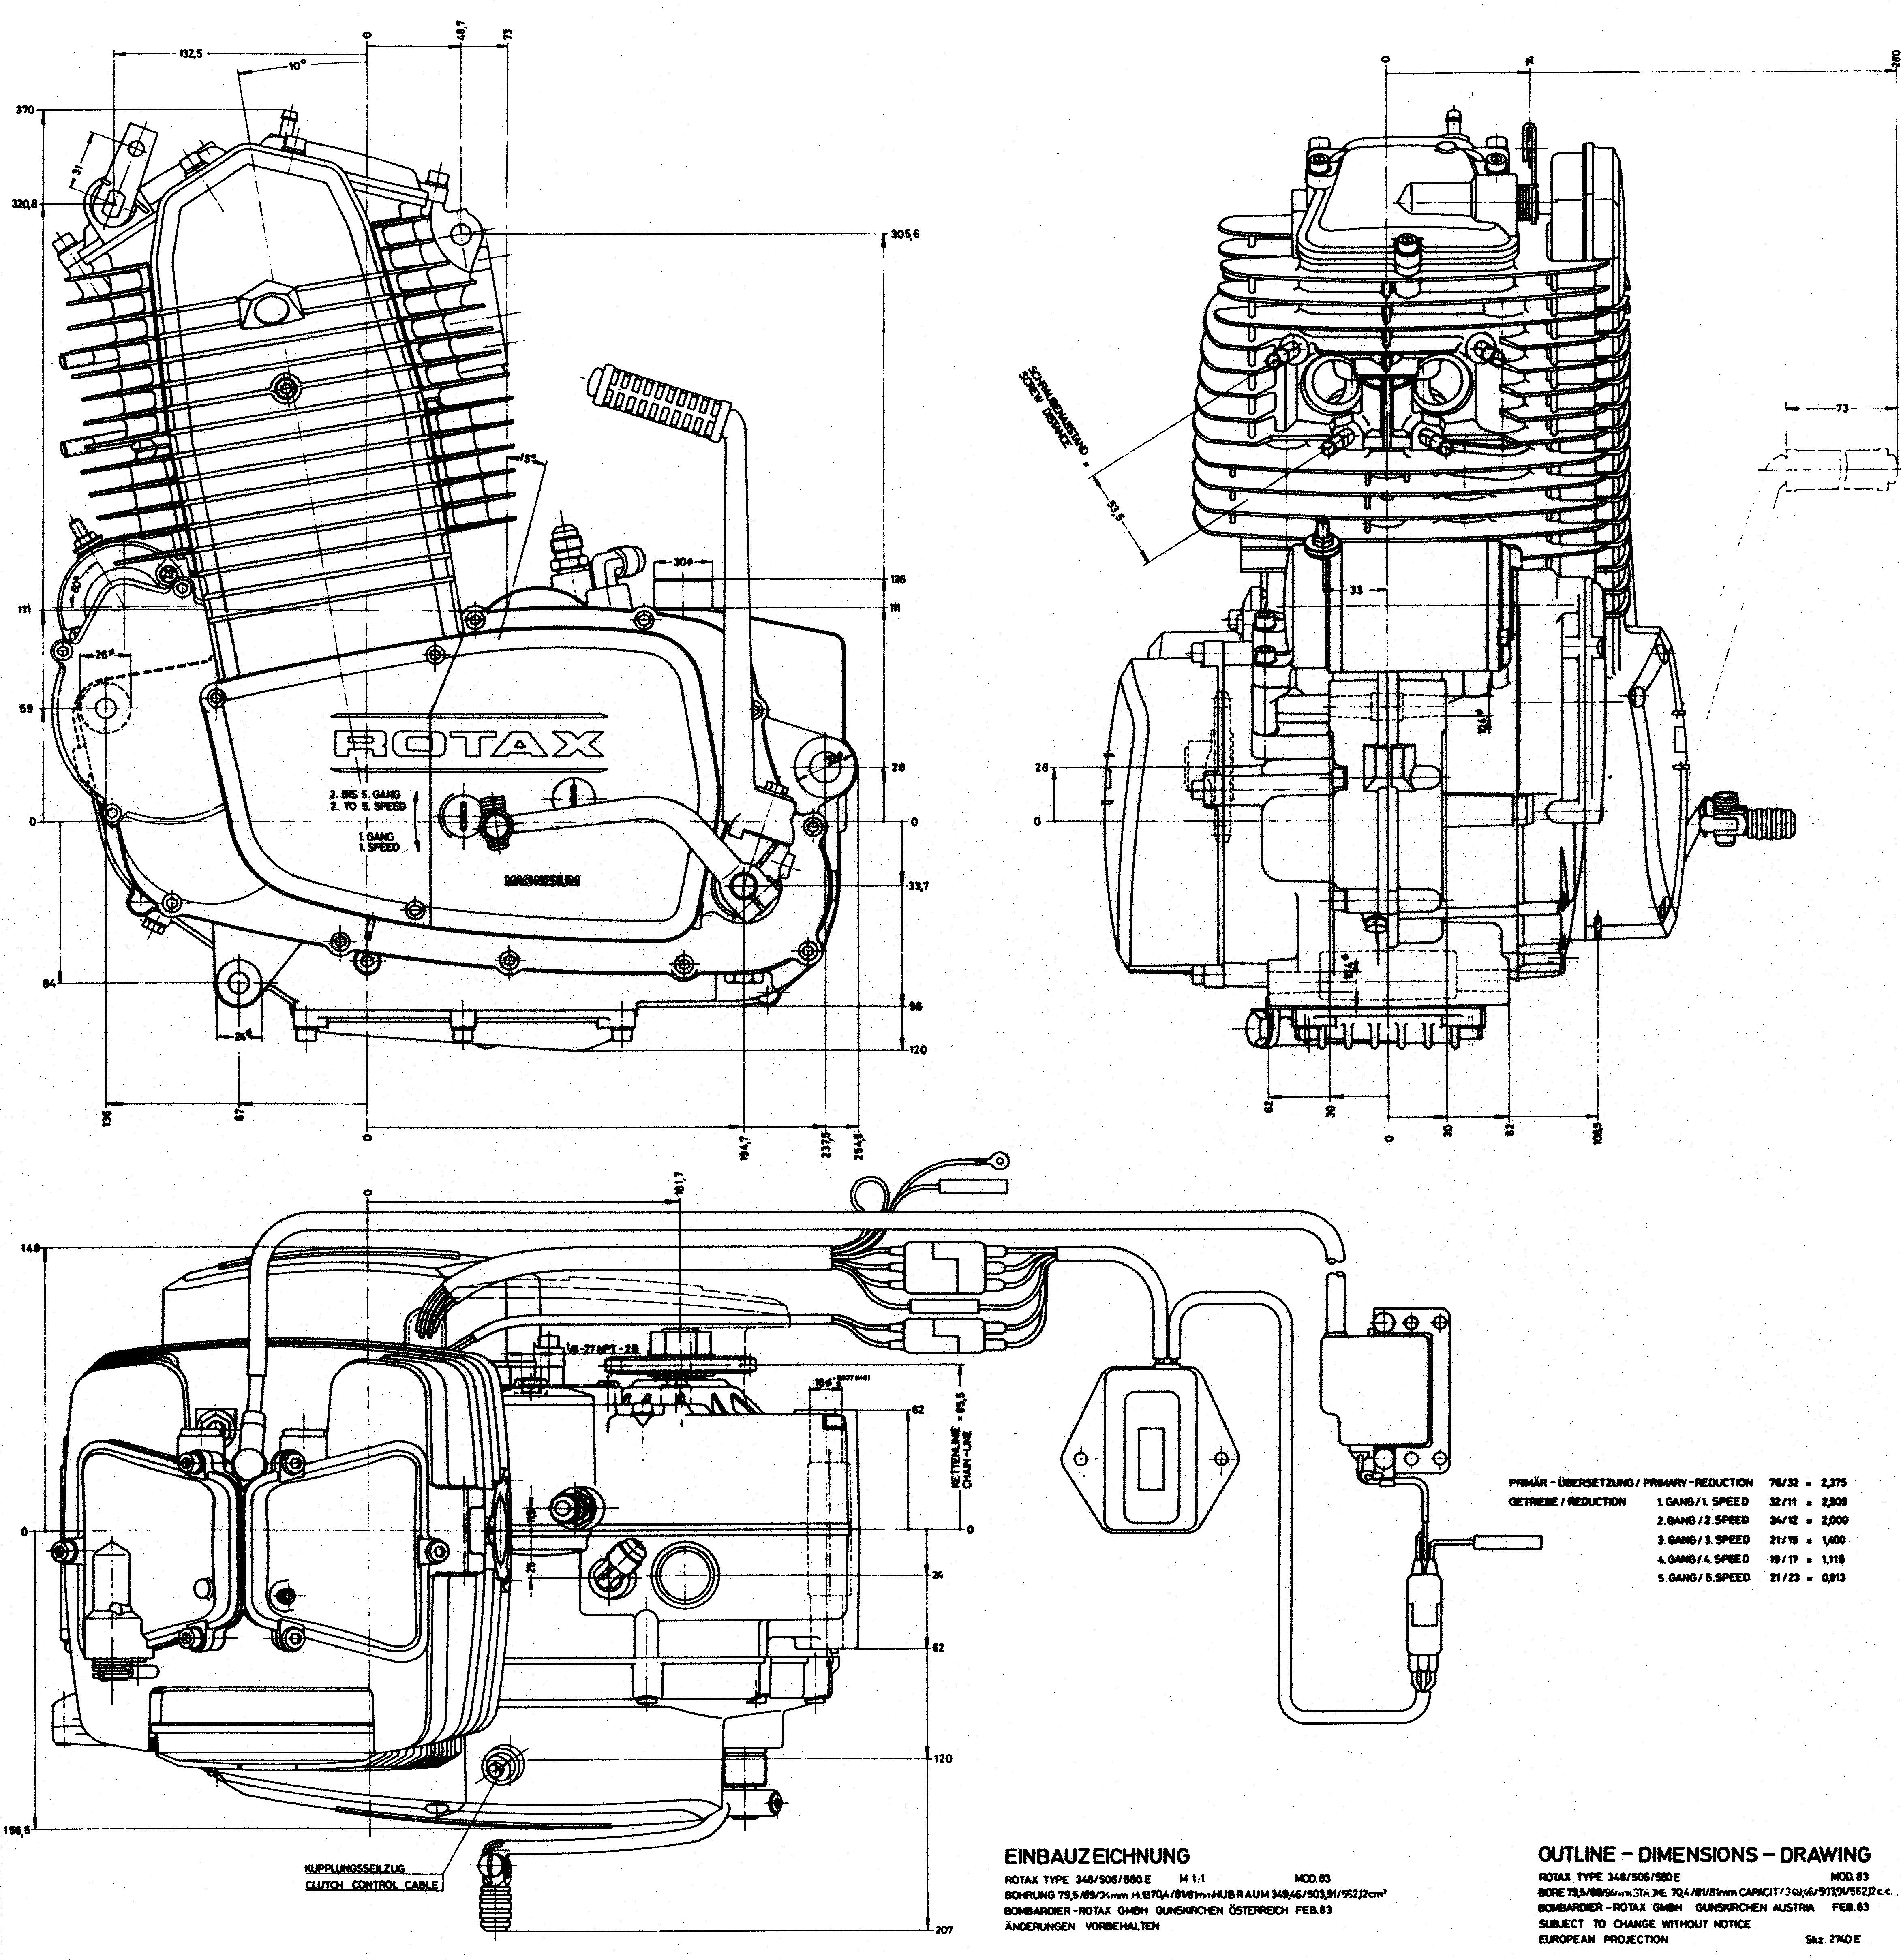 Rotax Engine Diagram Rotax Engine Of Rotax Engine Diagram Ulpower Ul260i